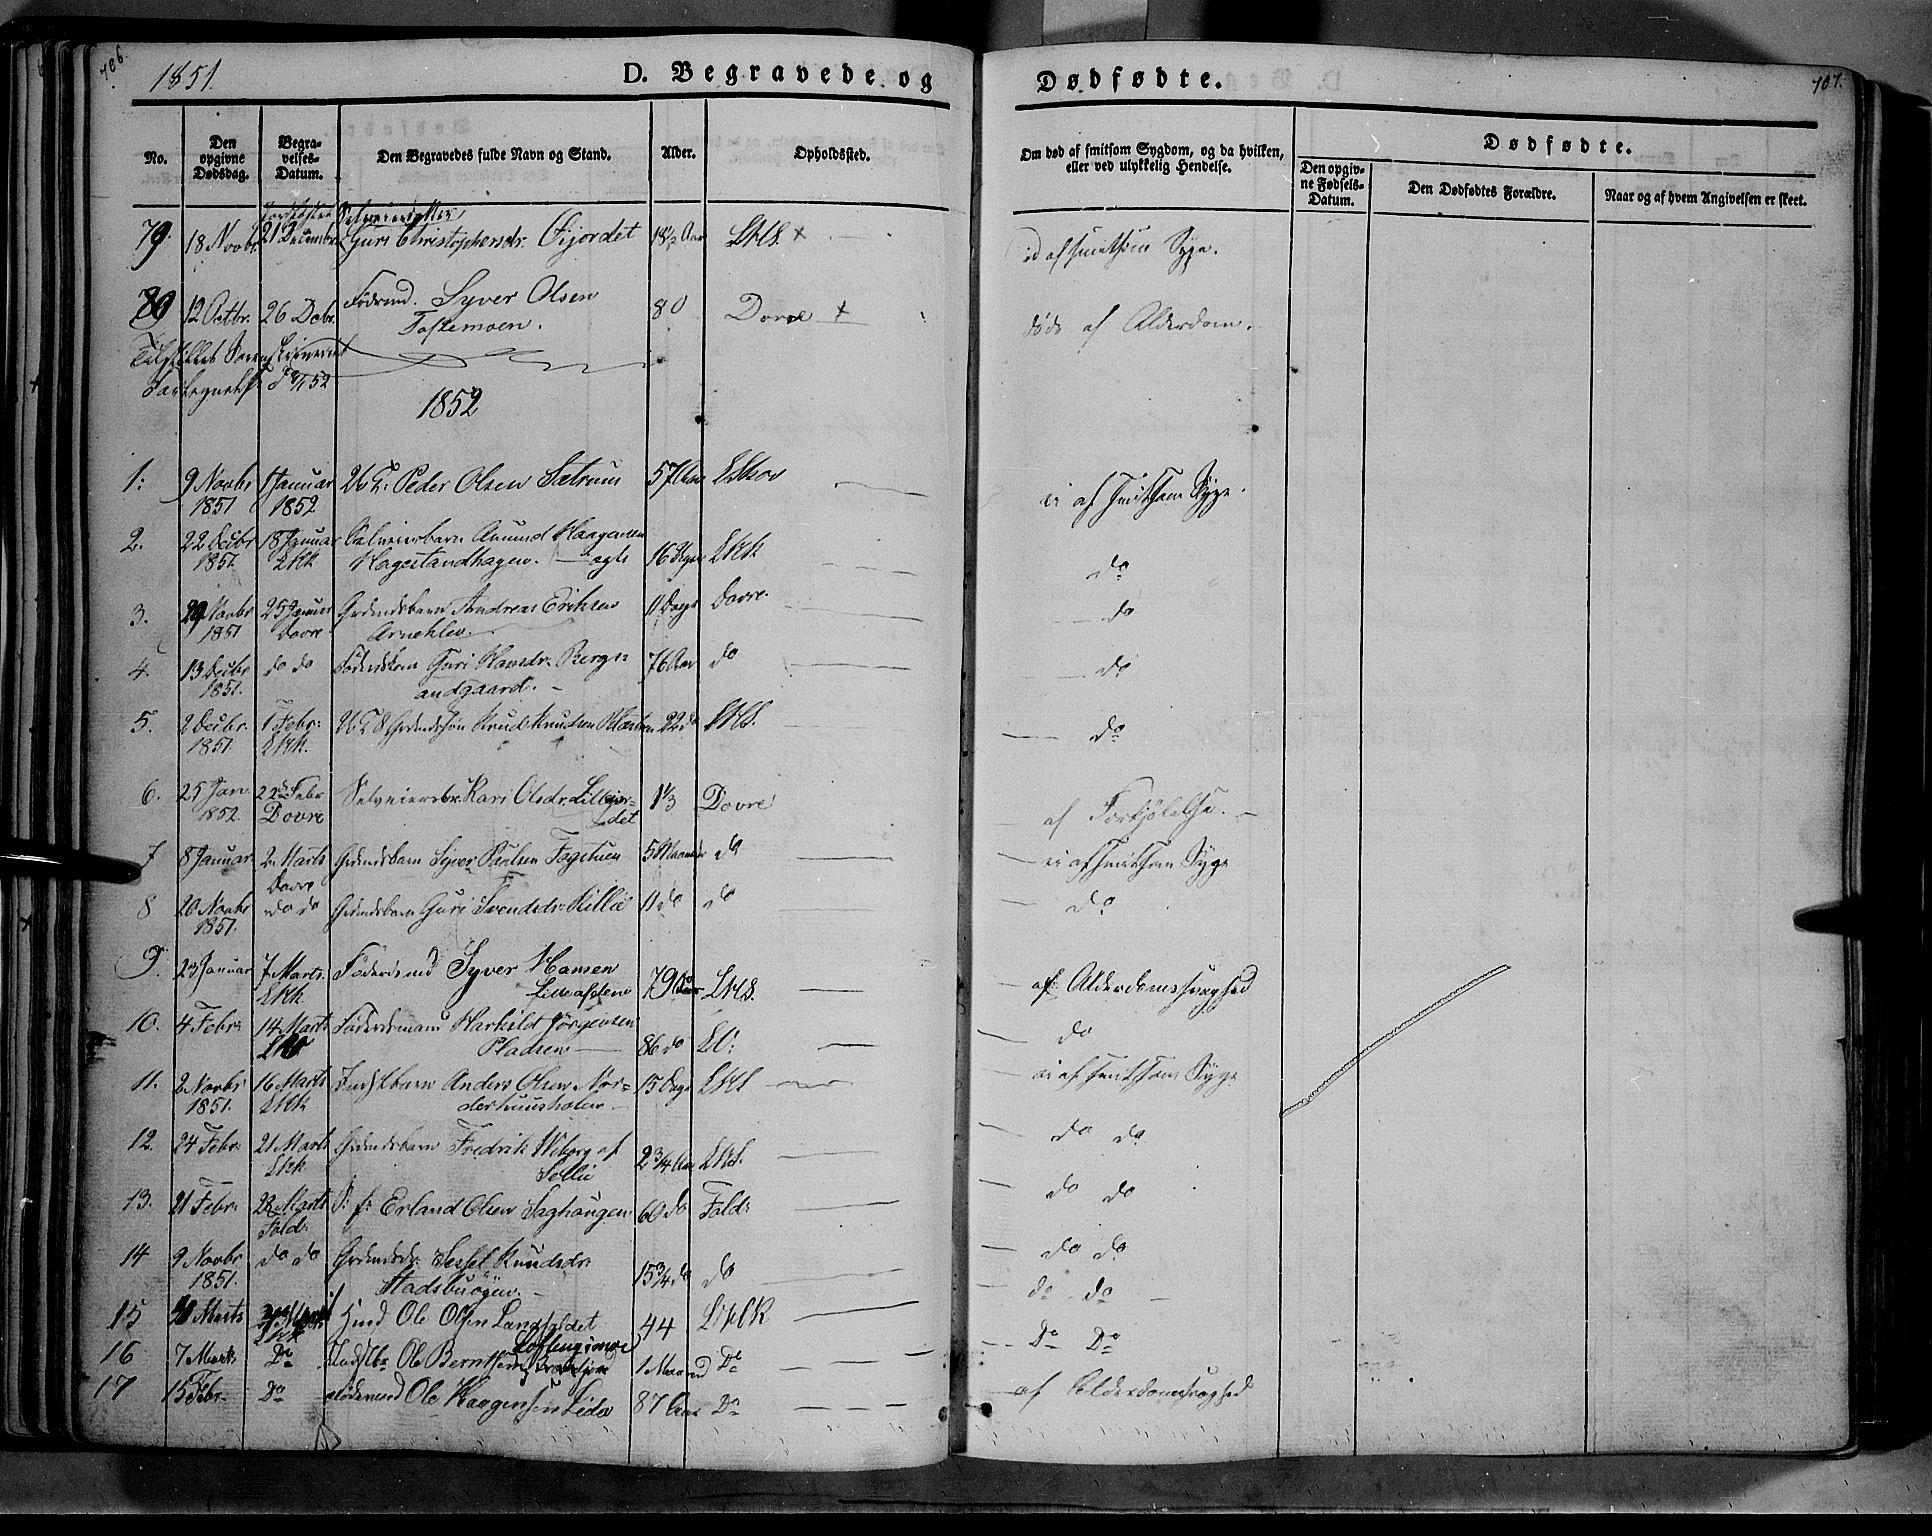 SAH, Lesja prestekontor, Ministerialbok nr. 6B, 1843-1854, s. 706-707